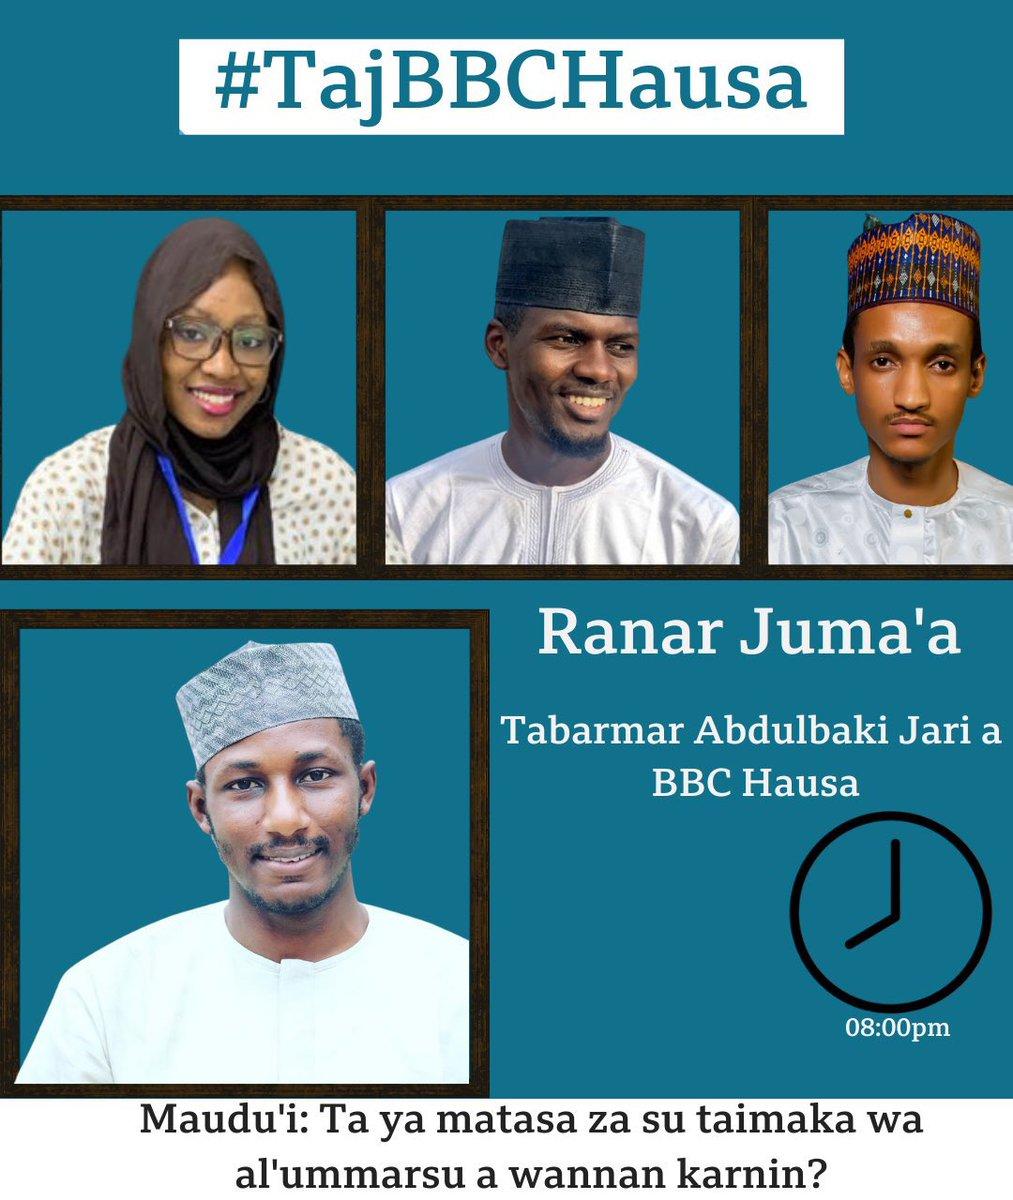 Tonight at 8pm. @Bahaushee is hosting us on his #tajbbhausa program. Stay tuned.